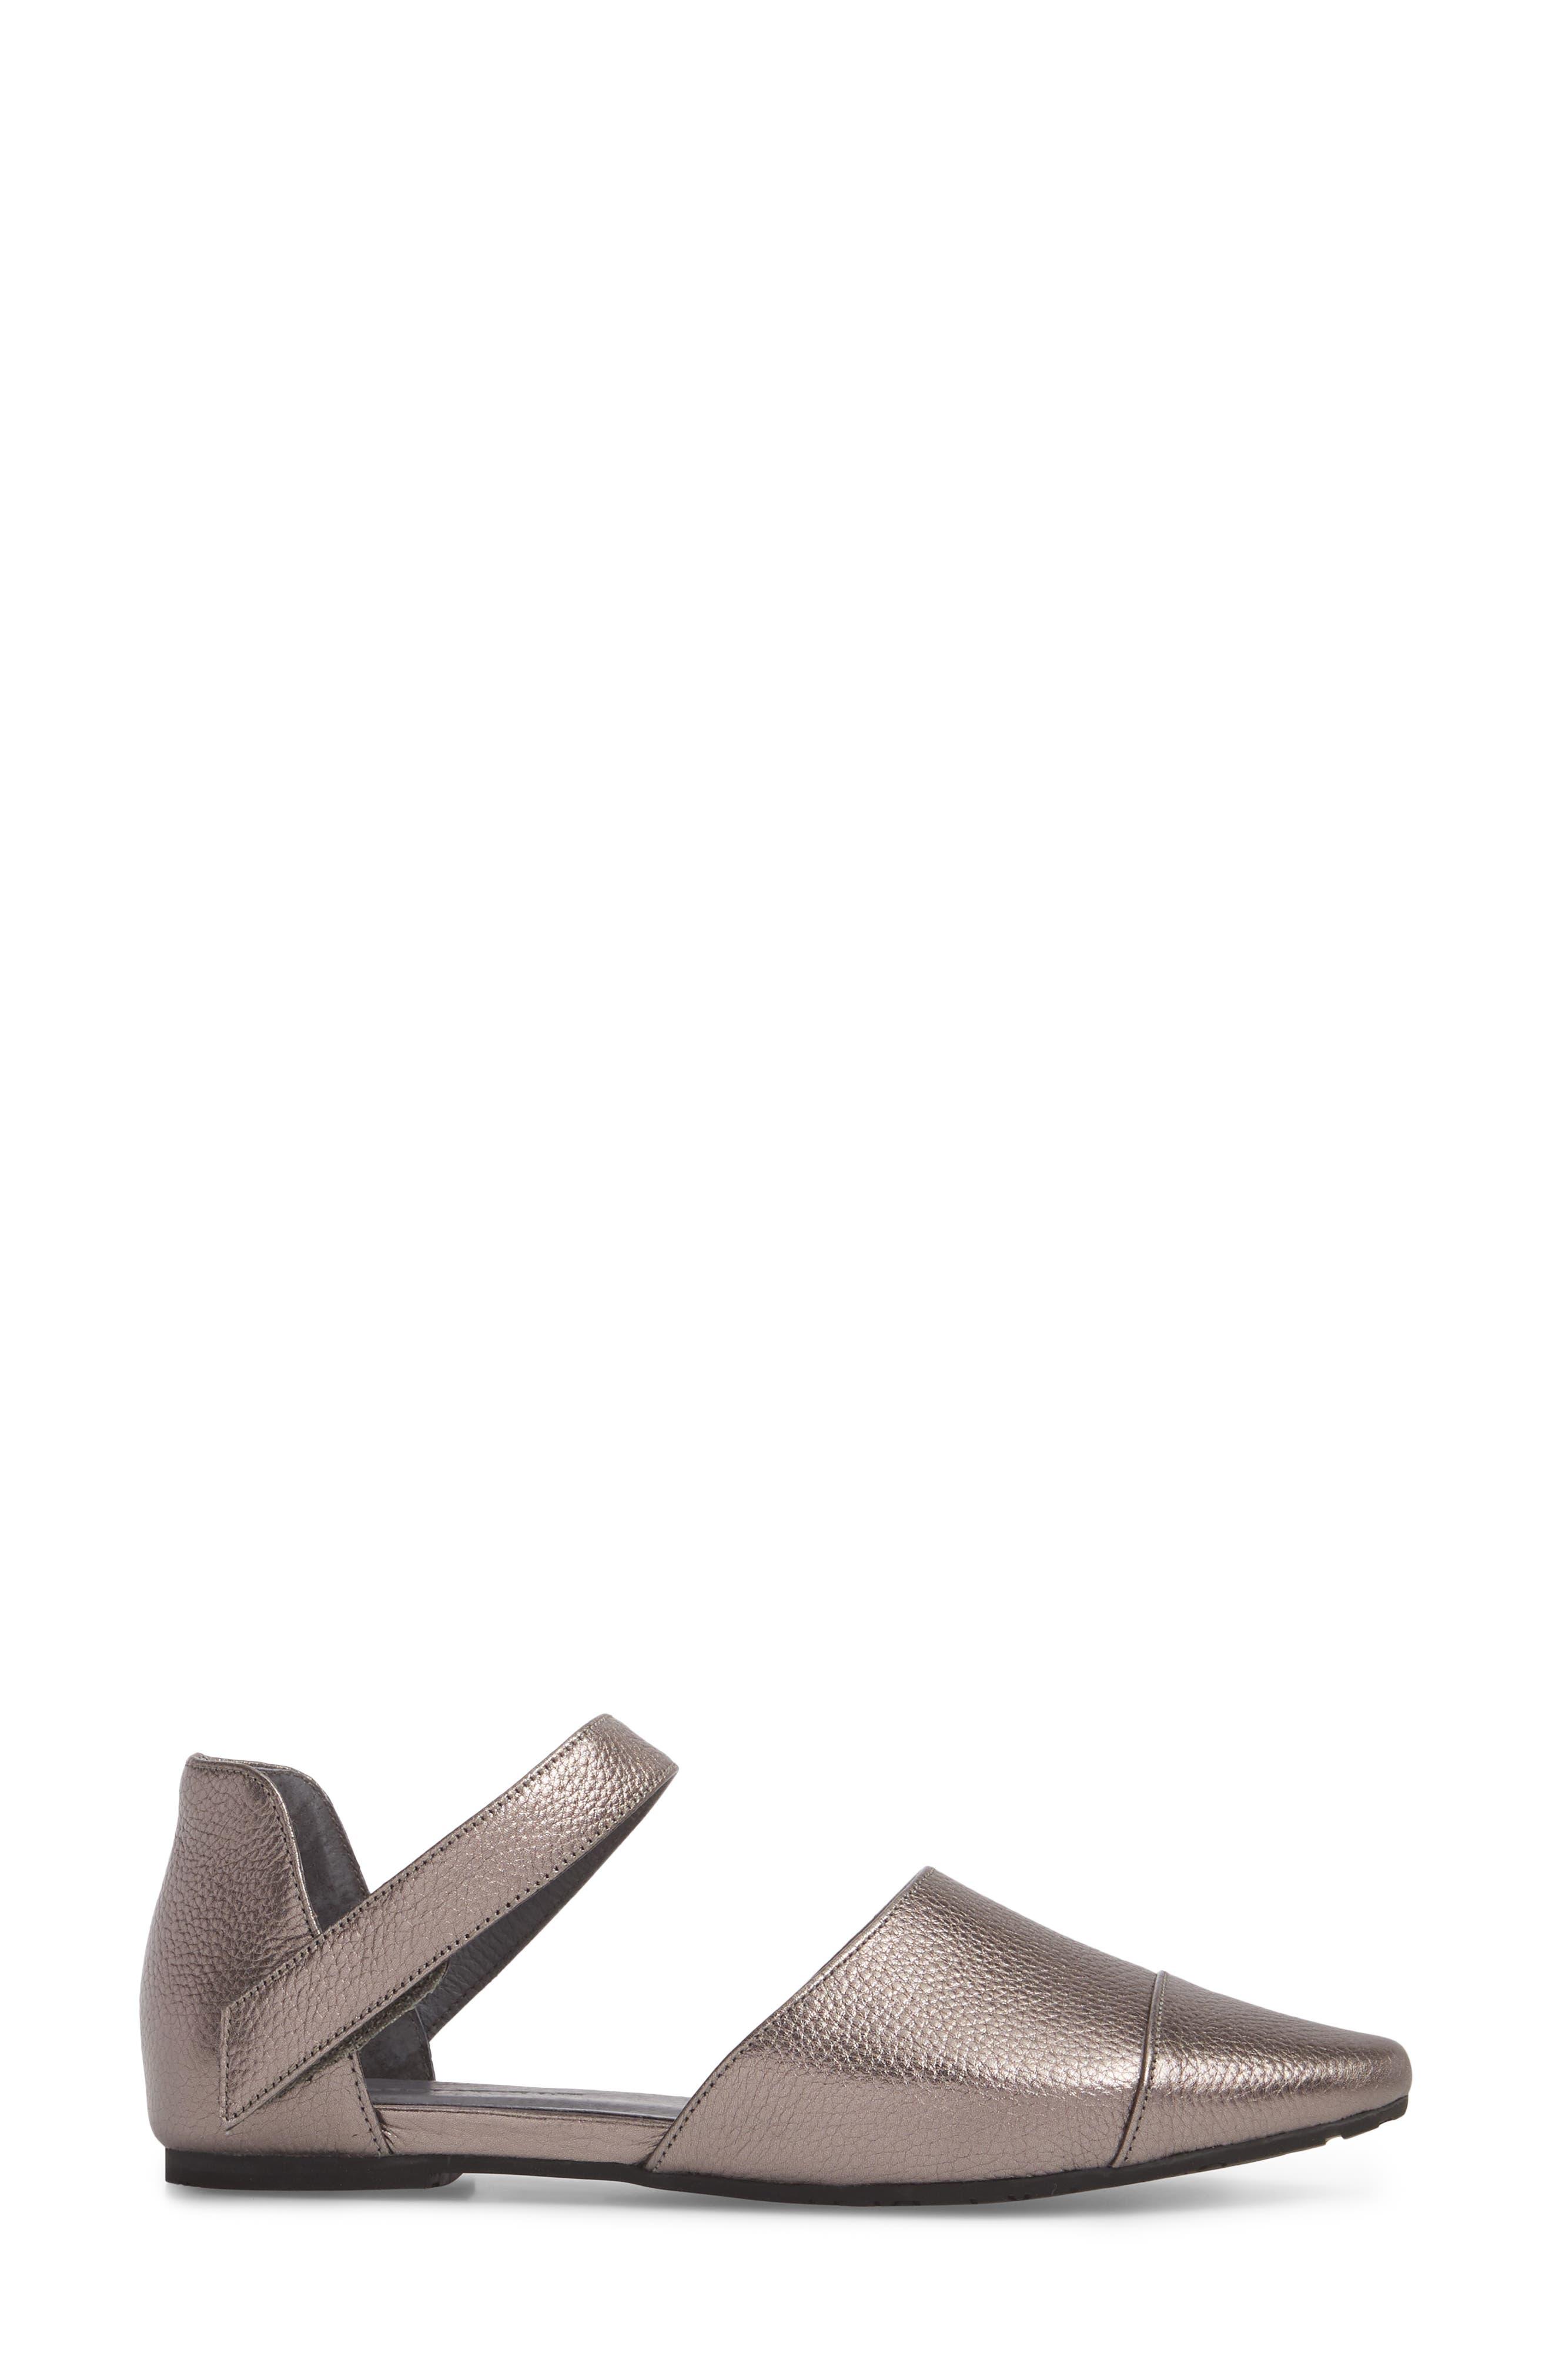 Gaia Pointy Toe Flat,                             Alternate thumbnail 3, color,                             Gunmetal Leather